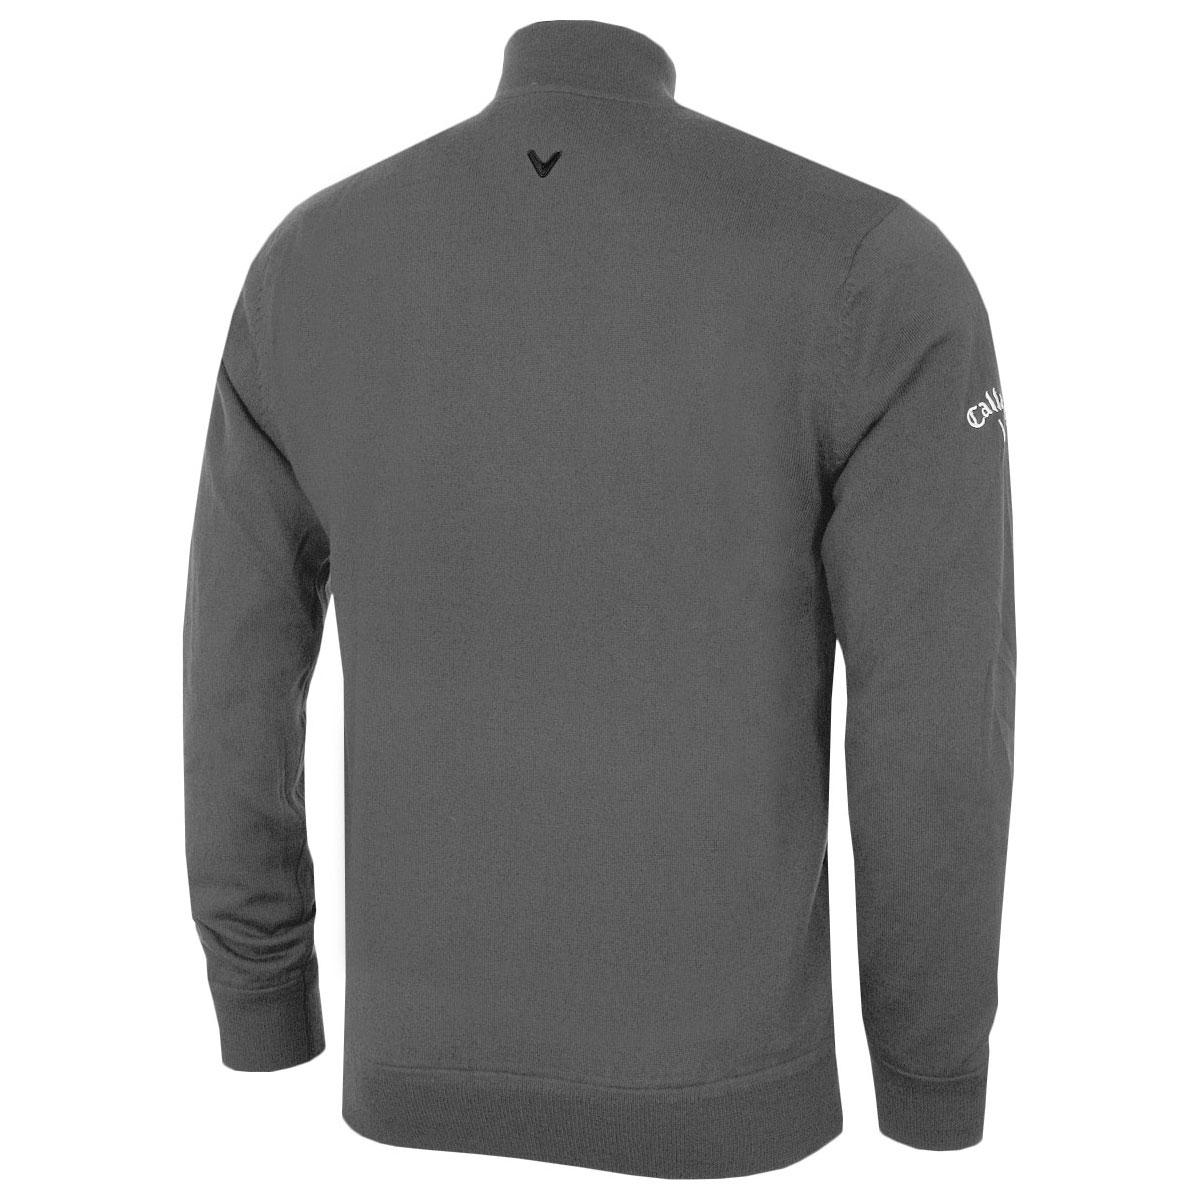 Callaway-Golf-Mens-1-4-Zip-Mock-Merino-Windproof-Sweater-Pullover-49-OFF-RRP thumbnail 16